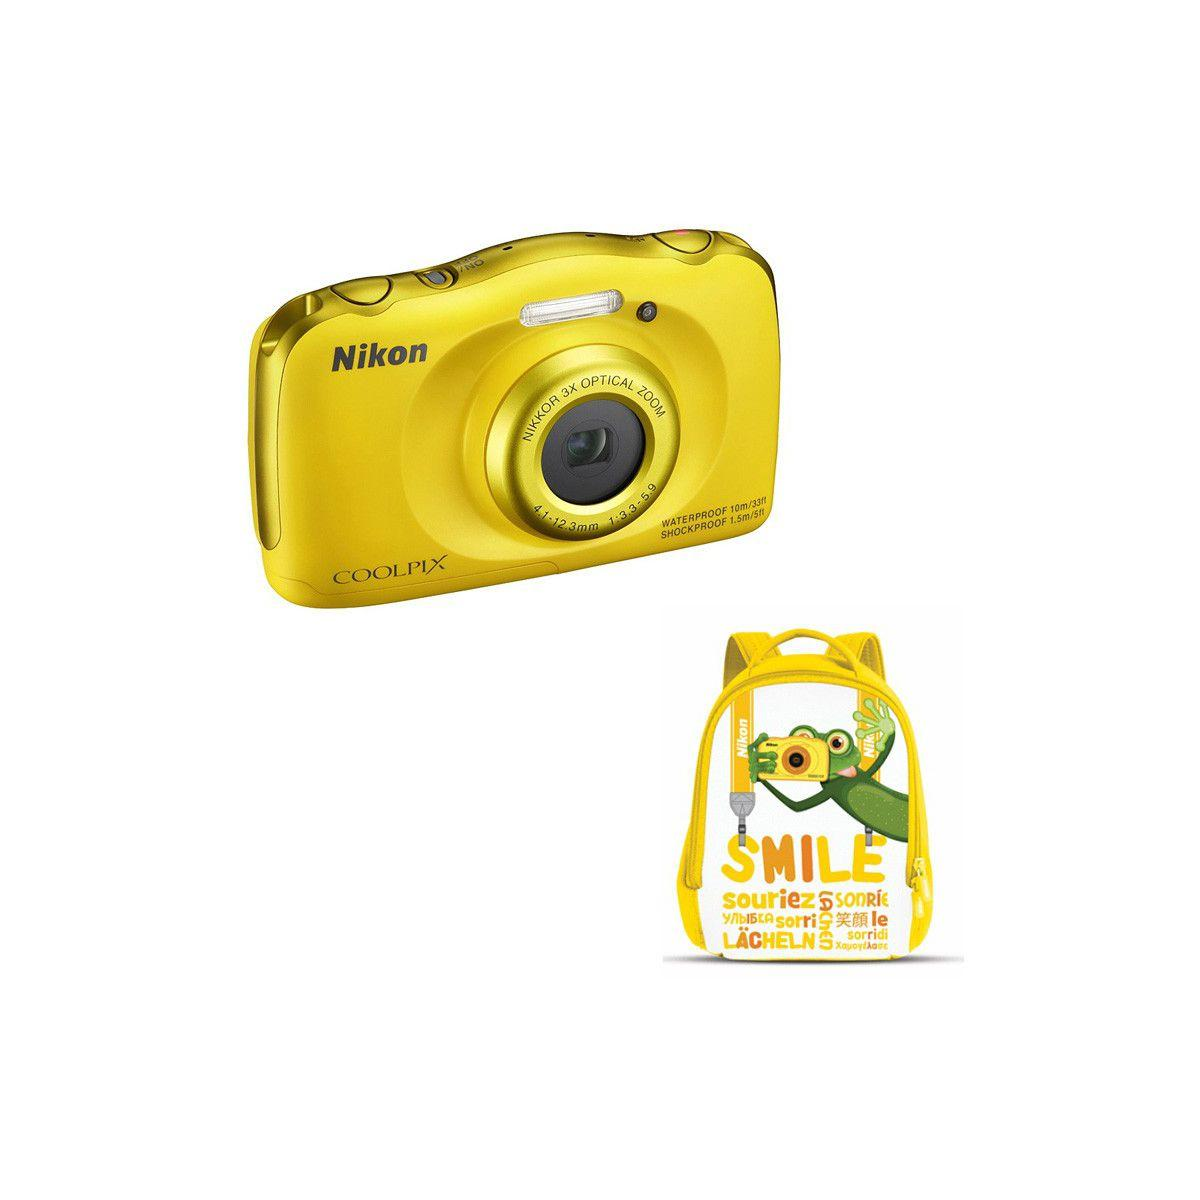 Appareil photo compact nikon coolpix w100 jaune + sac � dos (photo)